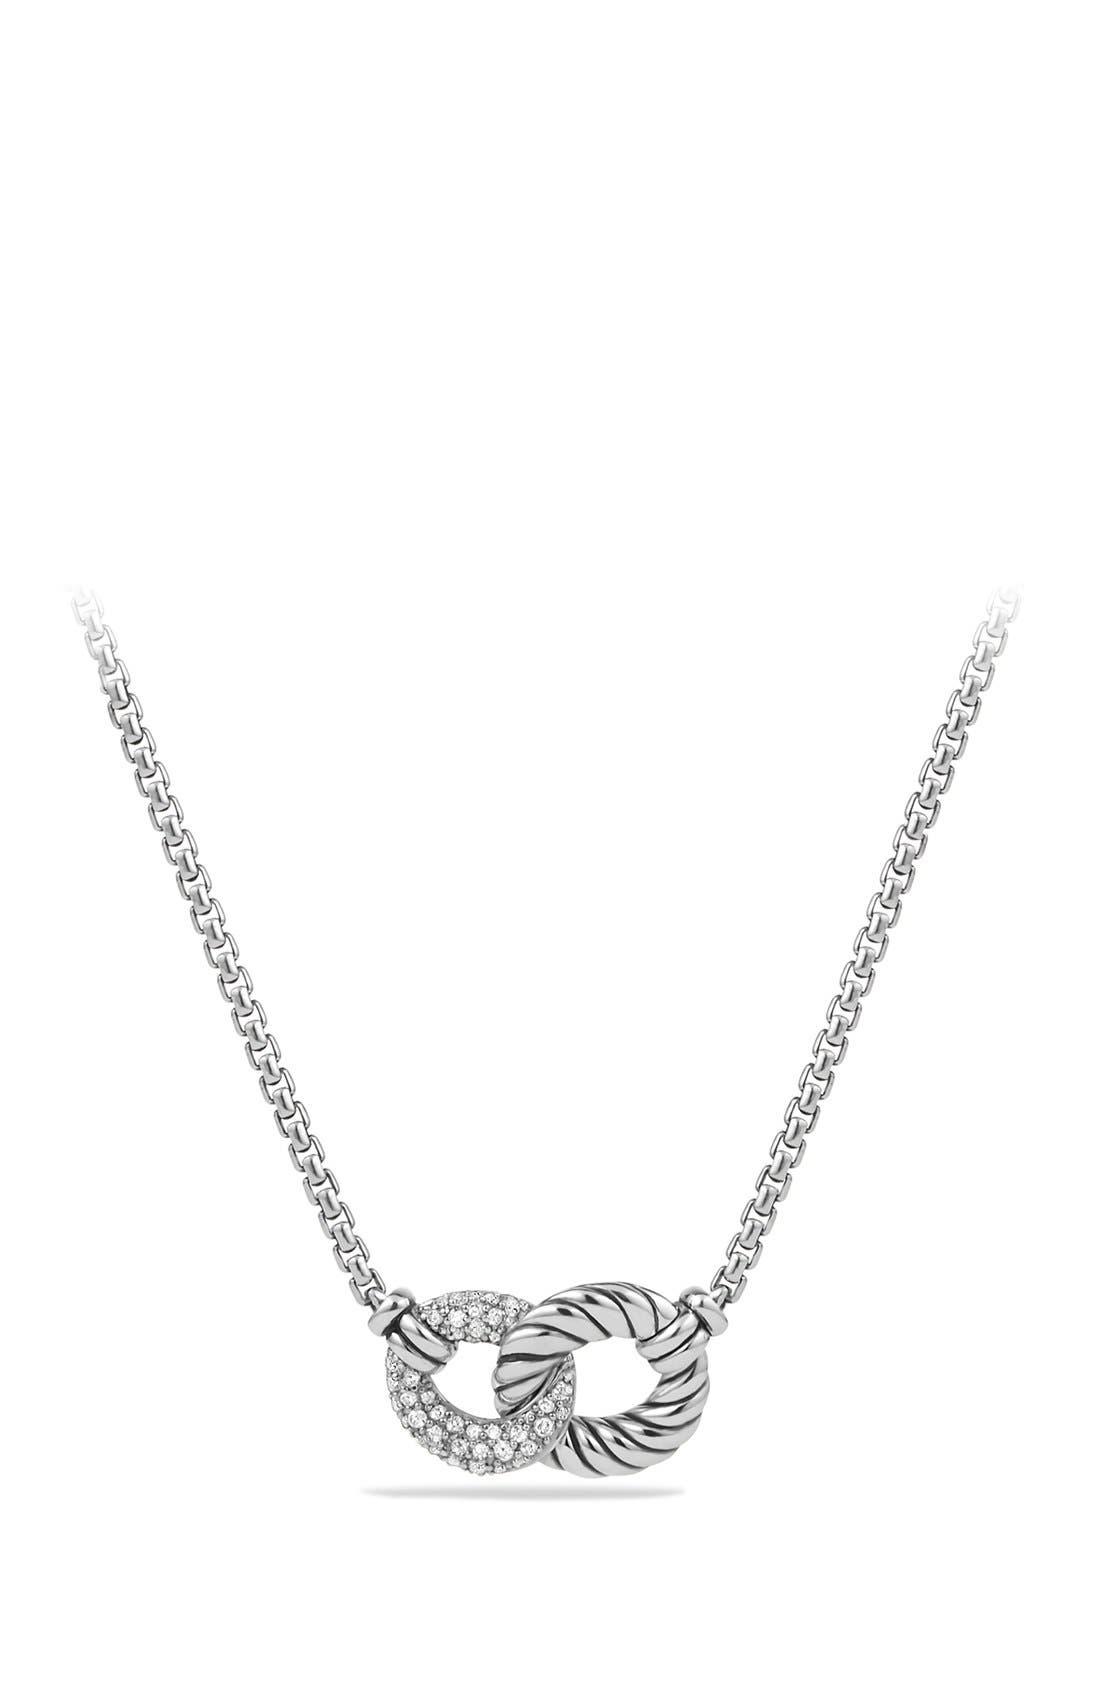 DAVID YURMAN Belmont Necklace with Diamonds